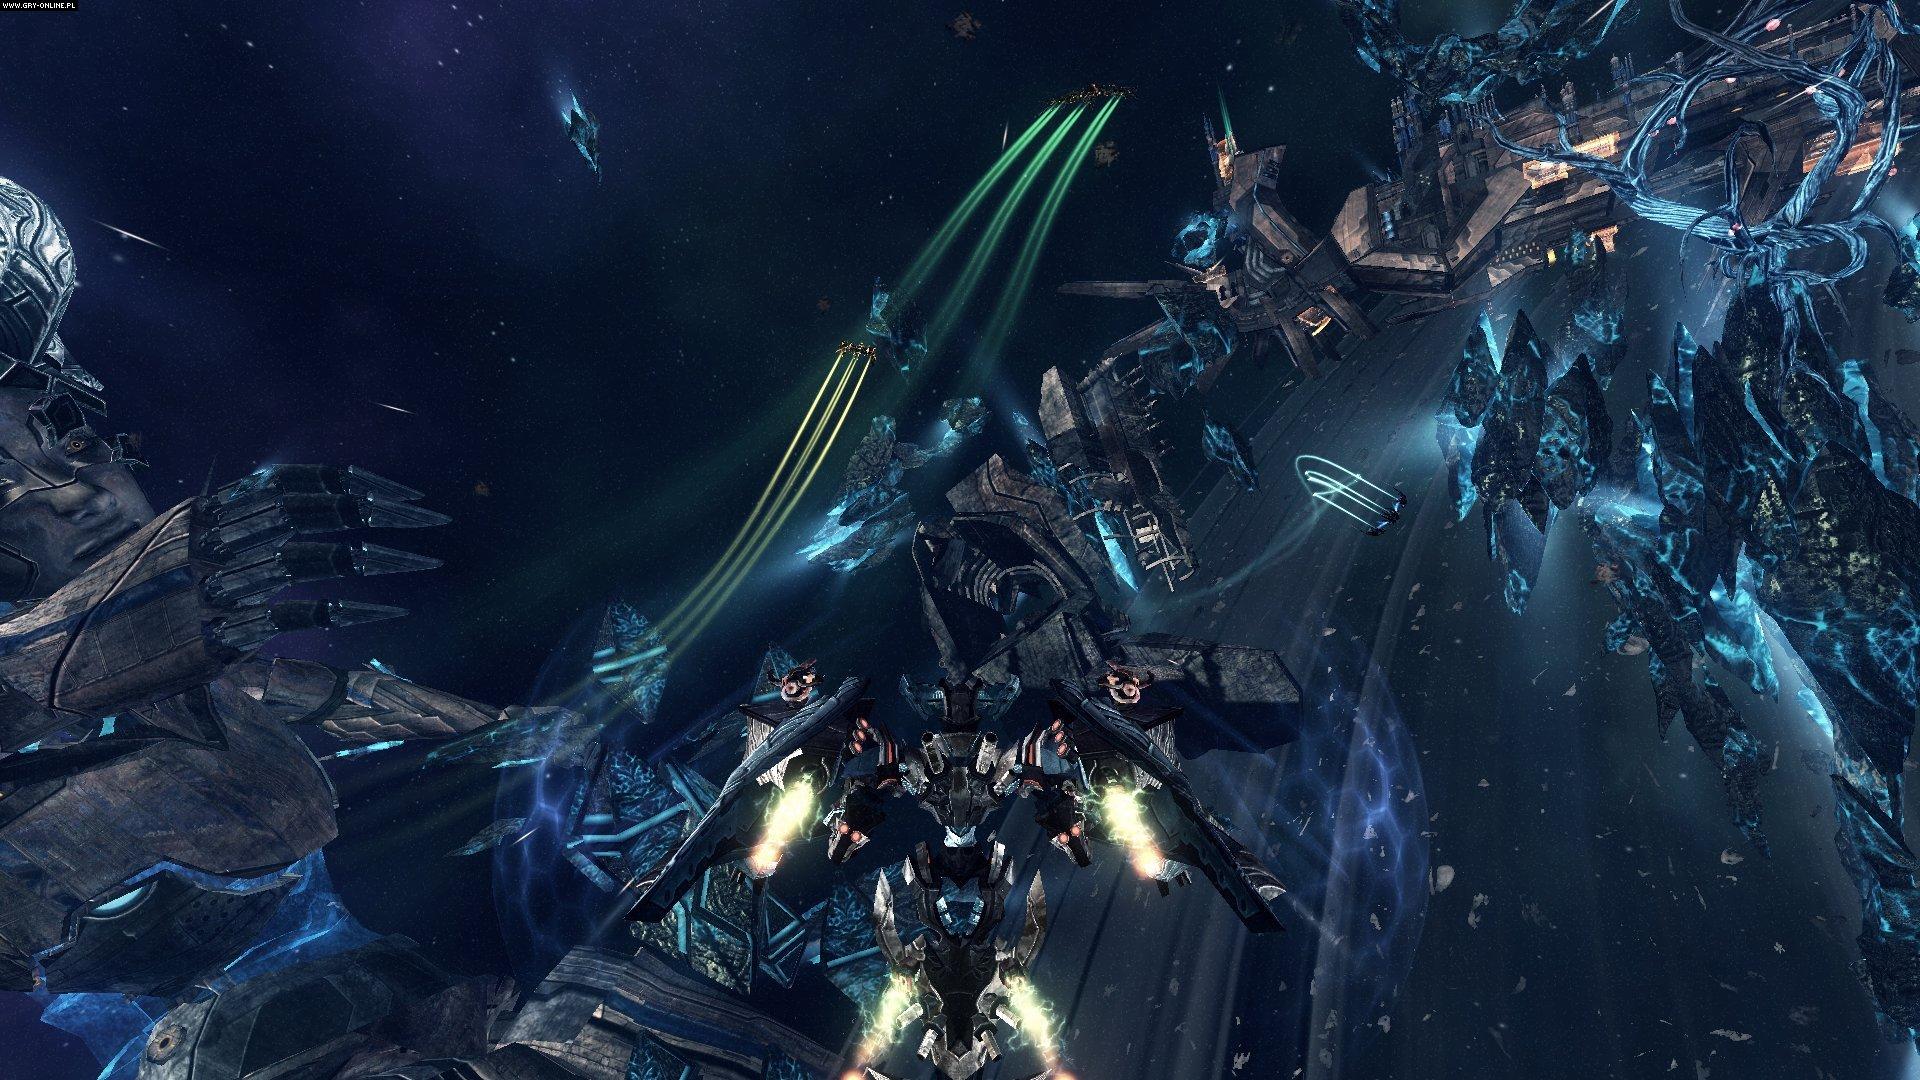 GoD Factory: Wingmen - screenshots gallery - screenshot 5/17